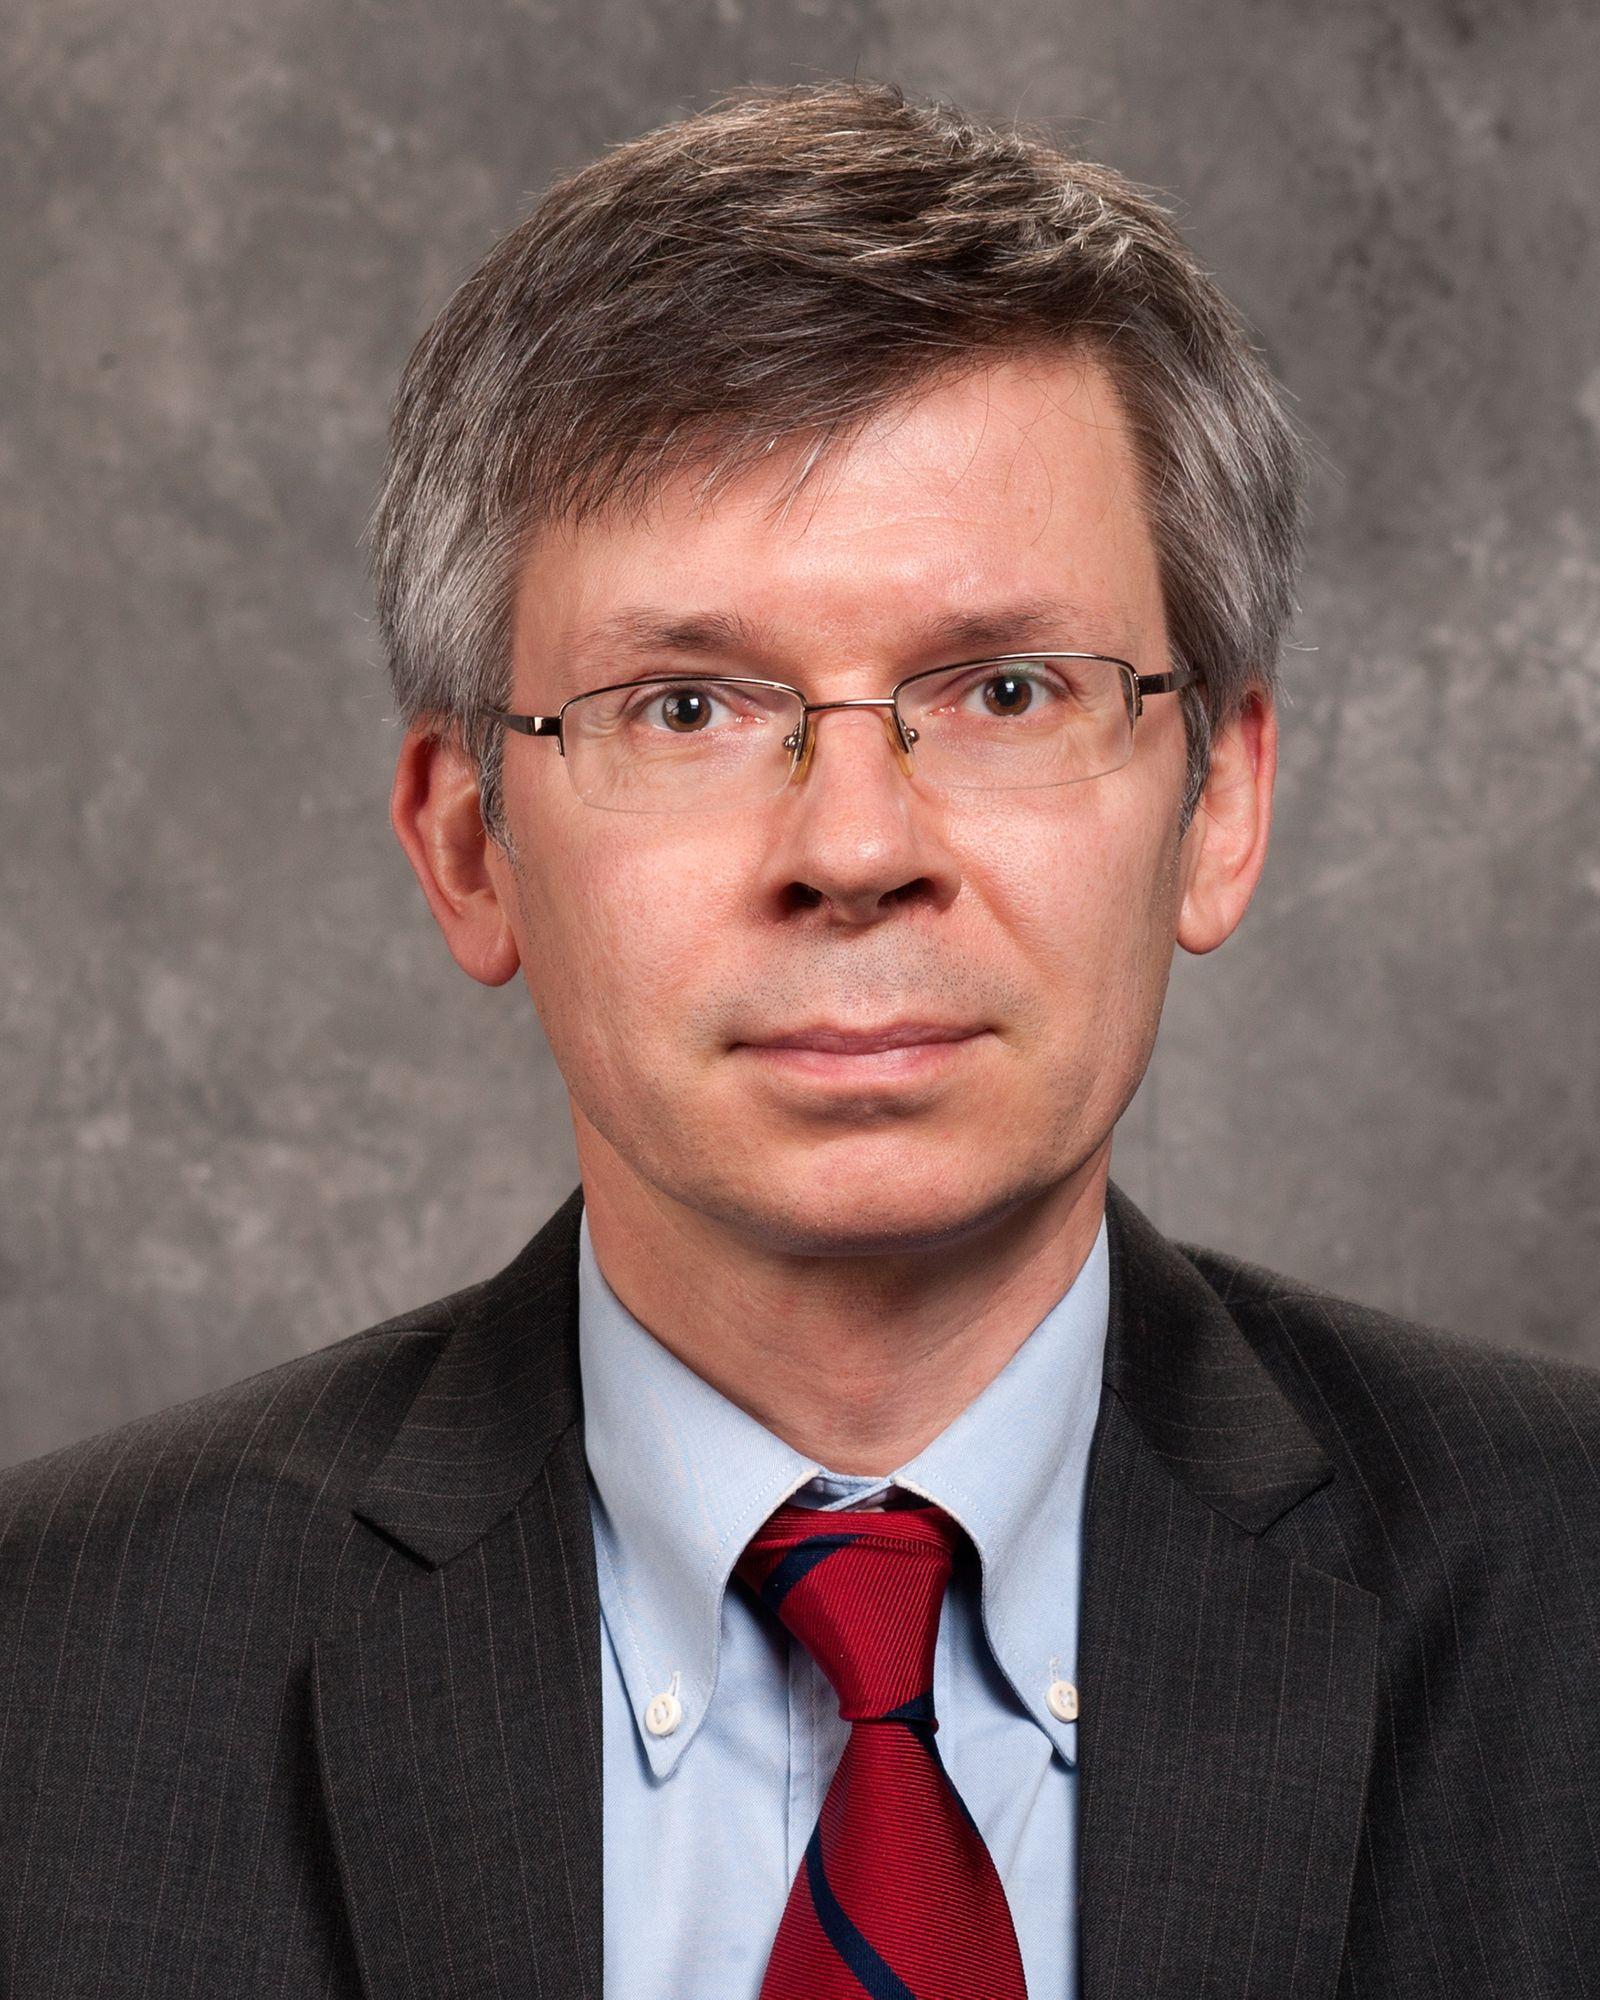 Thomas Laubach / Federal Reserve Board